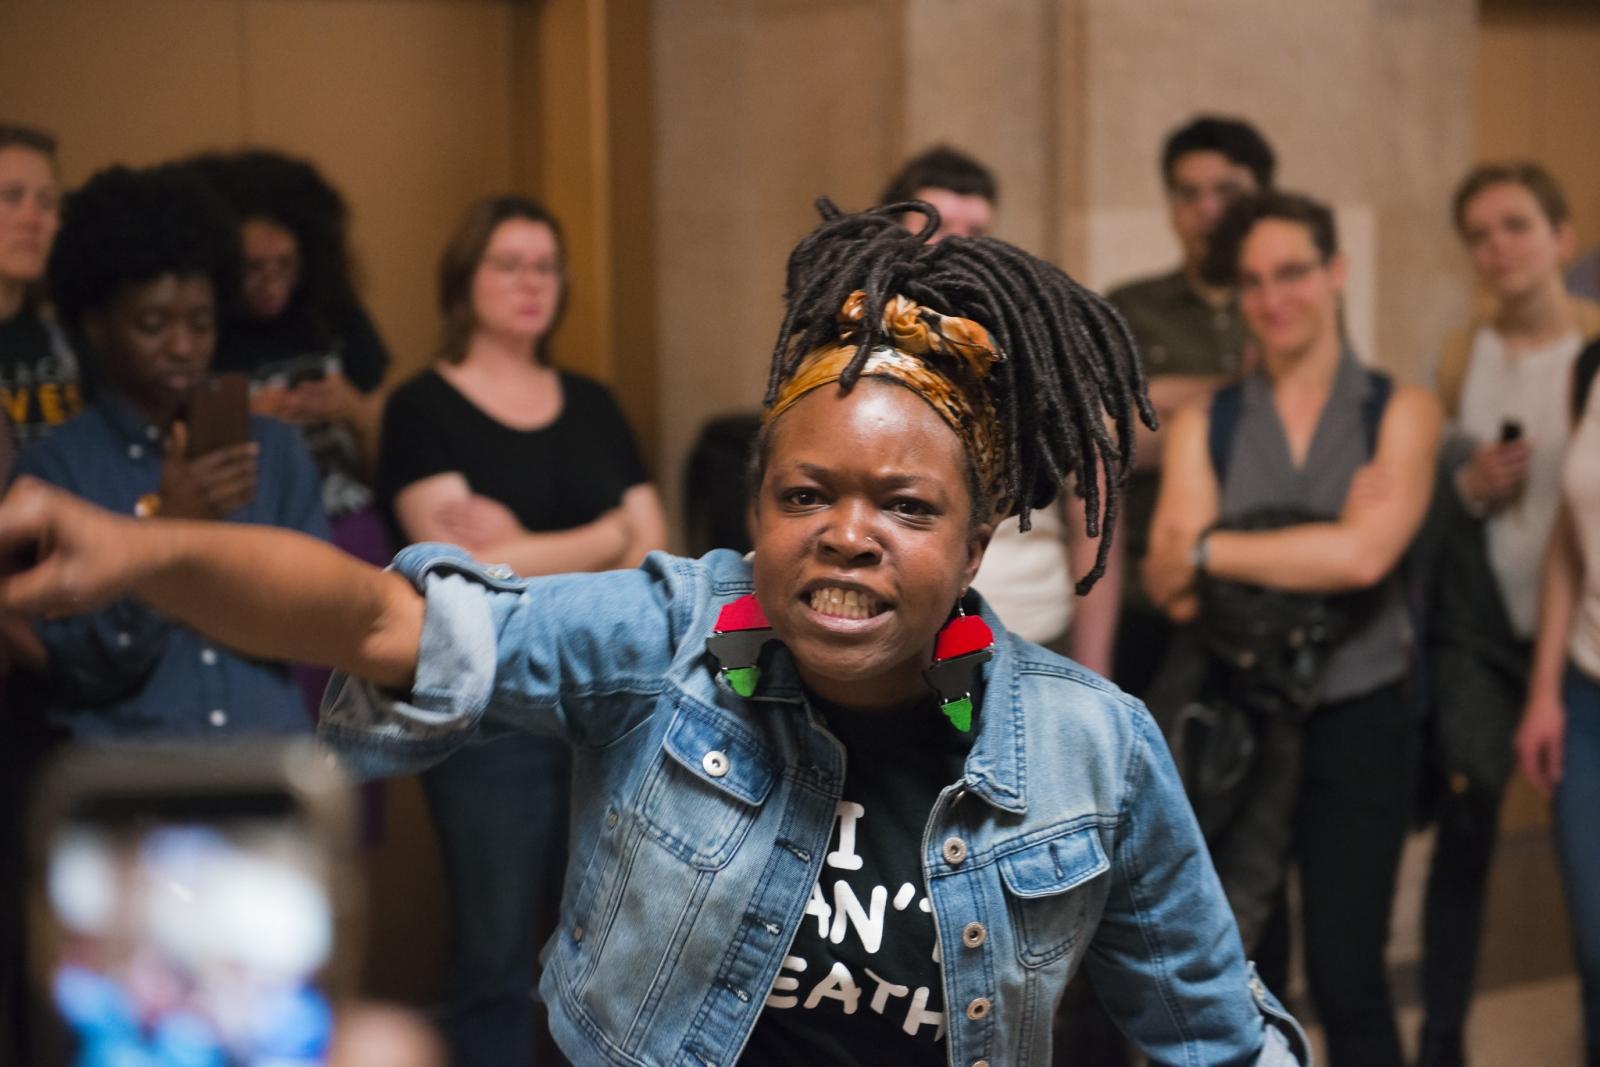 Photography image -  05.23.18  No Cop Academy activist at city hall.